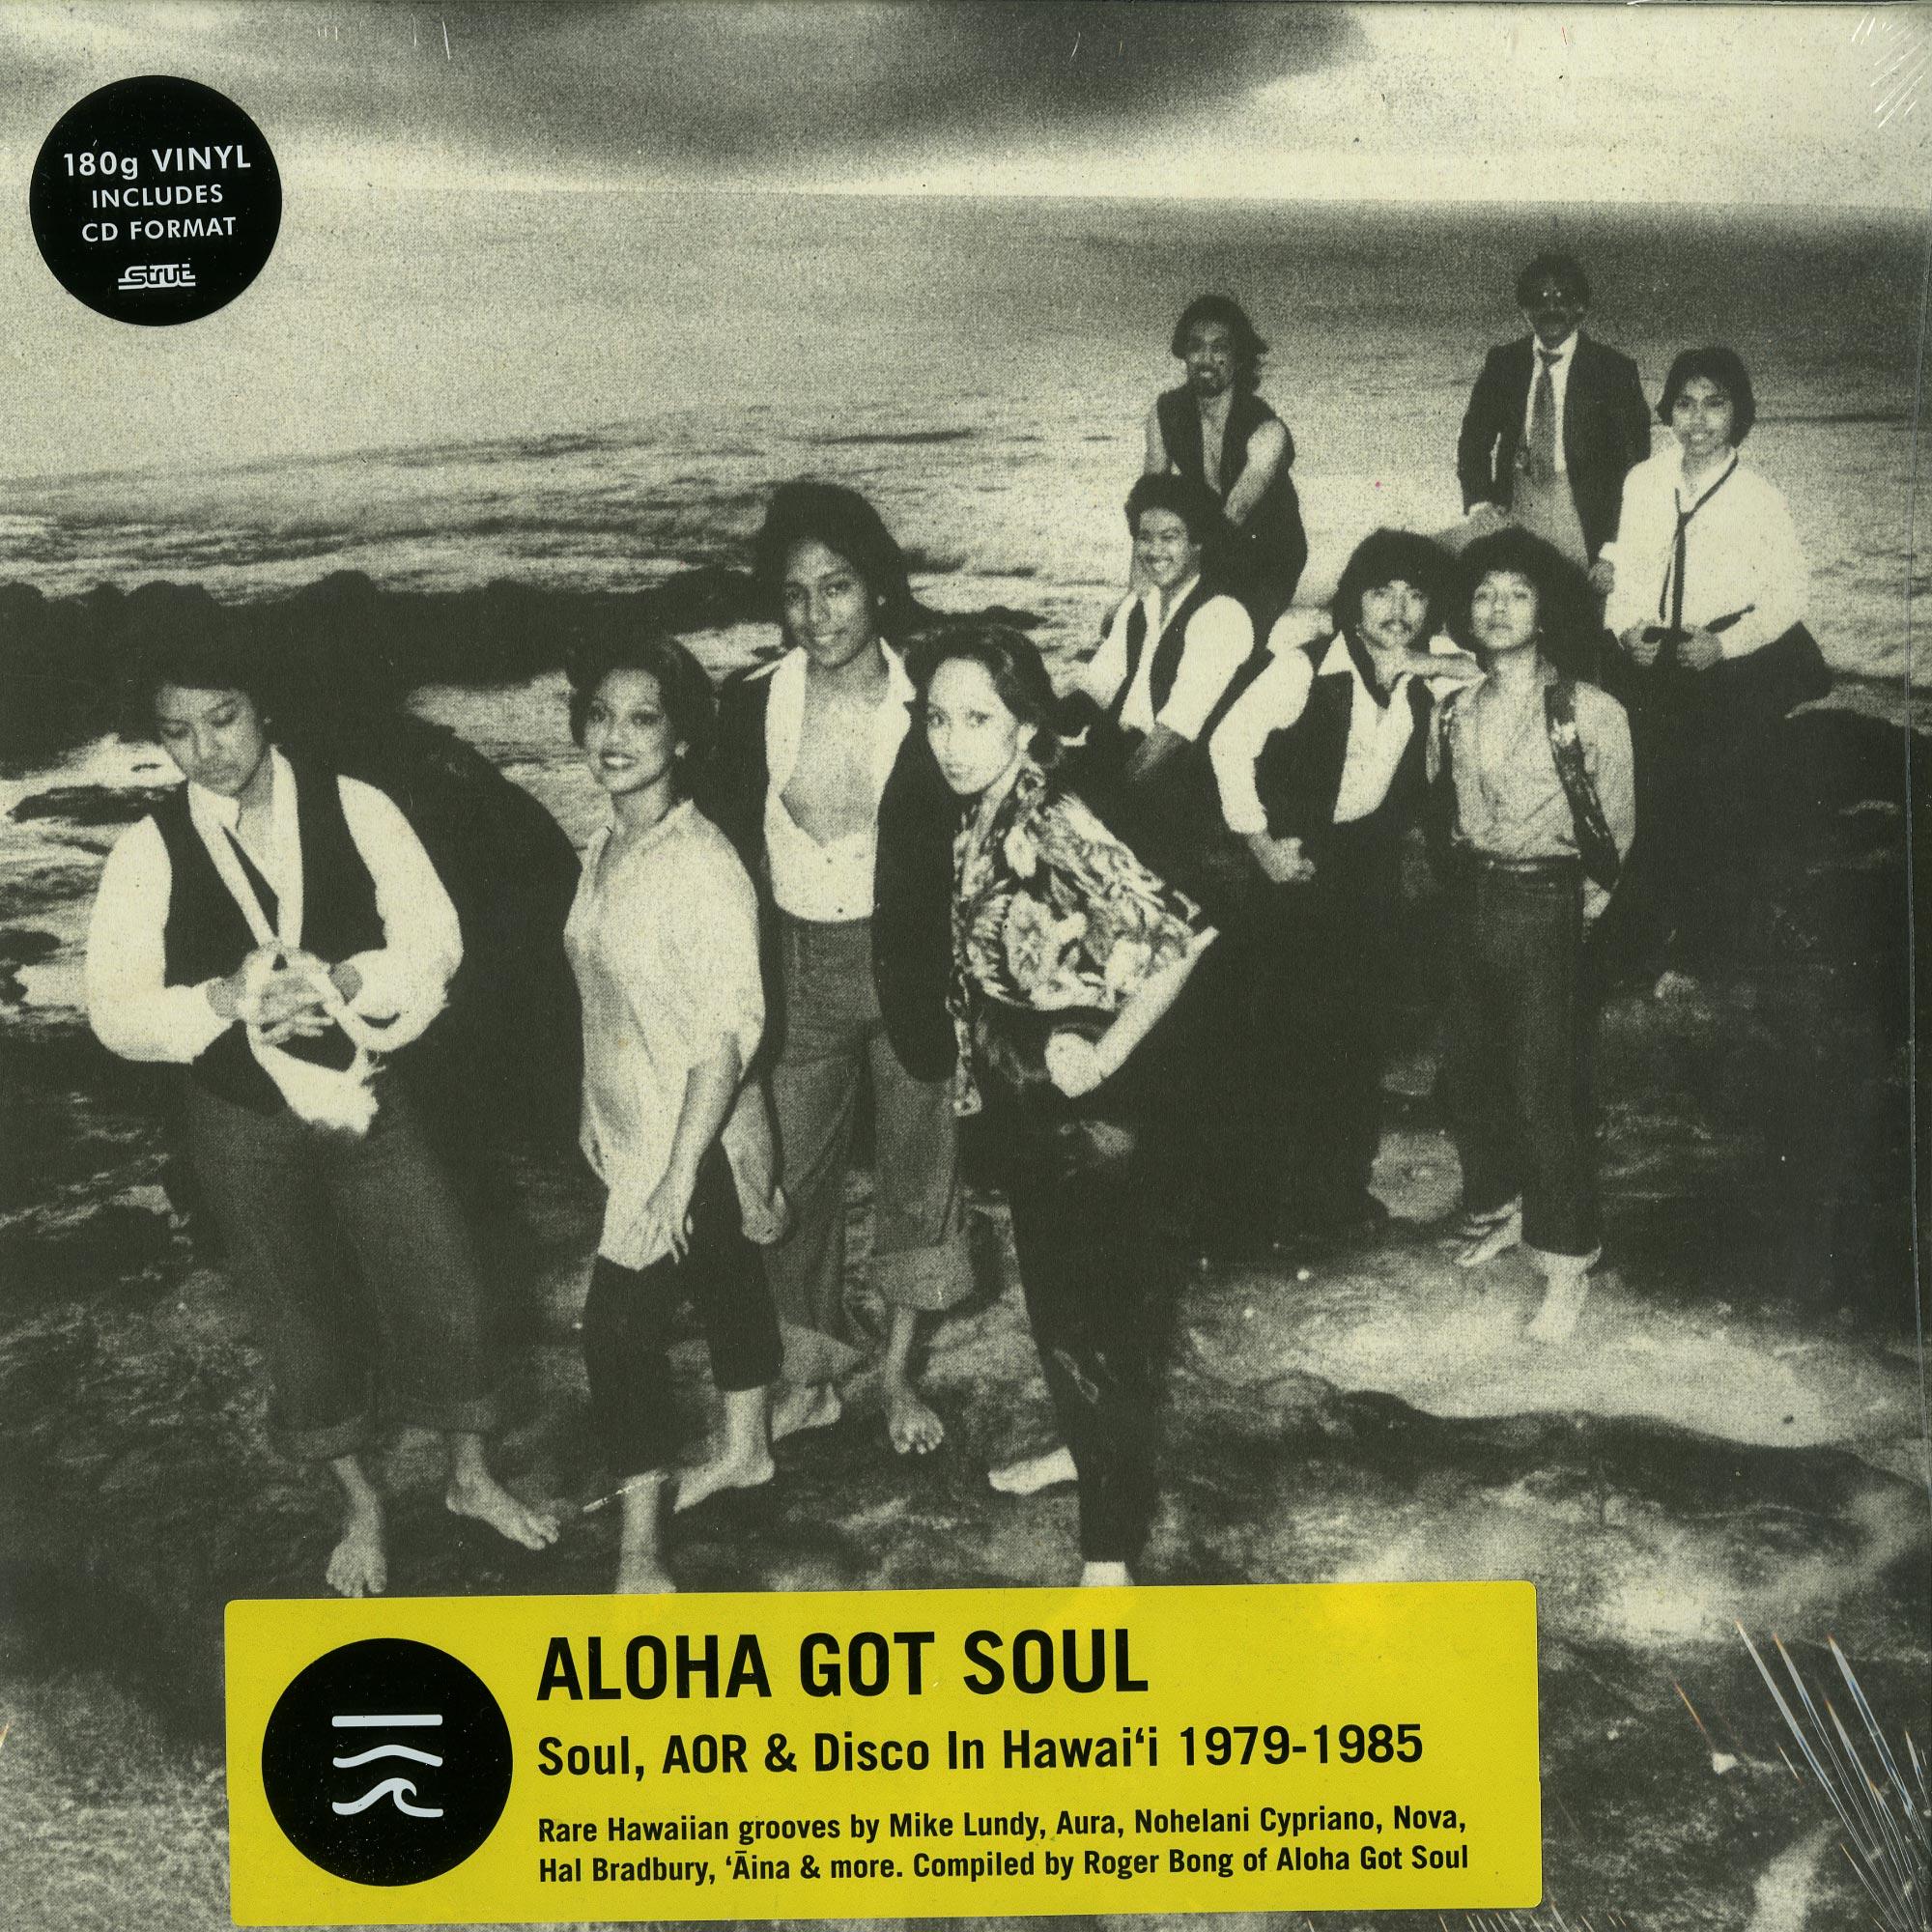 Various Artists - ALOHA GOT SOUL - SOUL. AOR & DISCO IN HAWAII 1979-1985